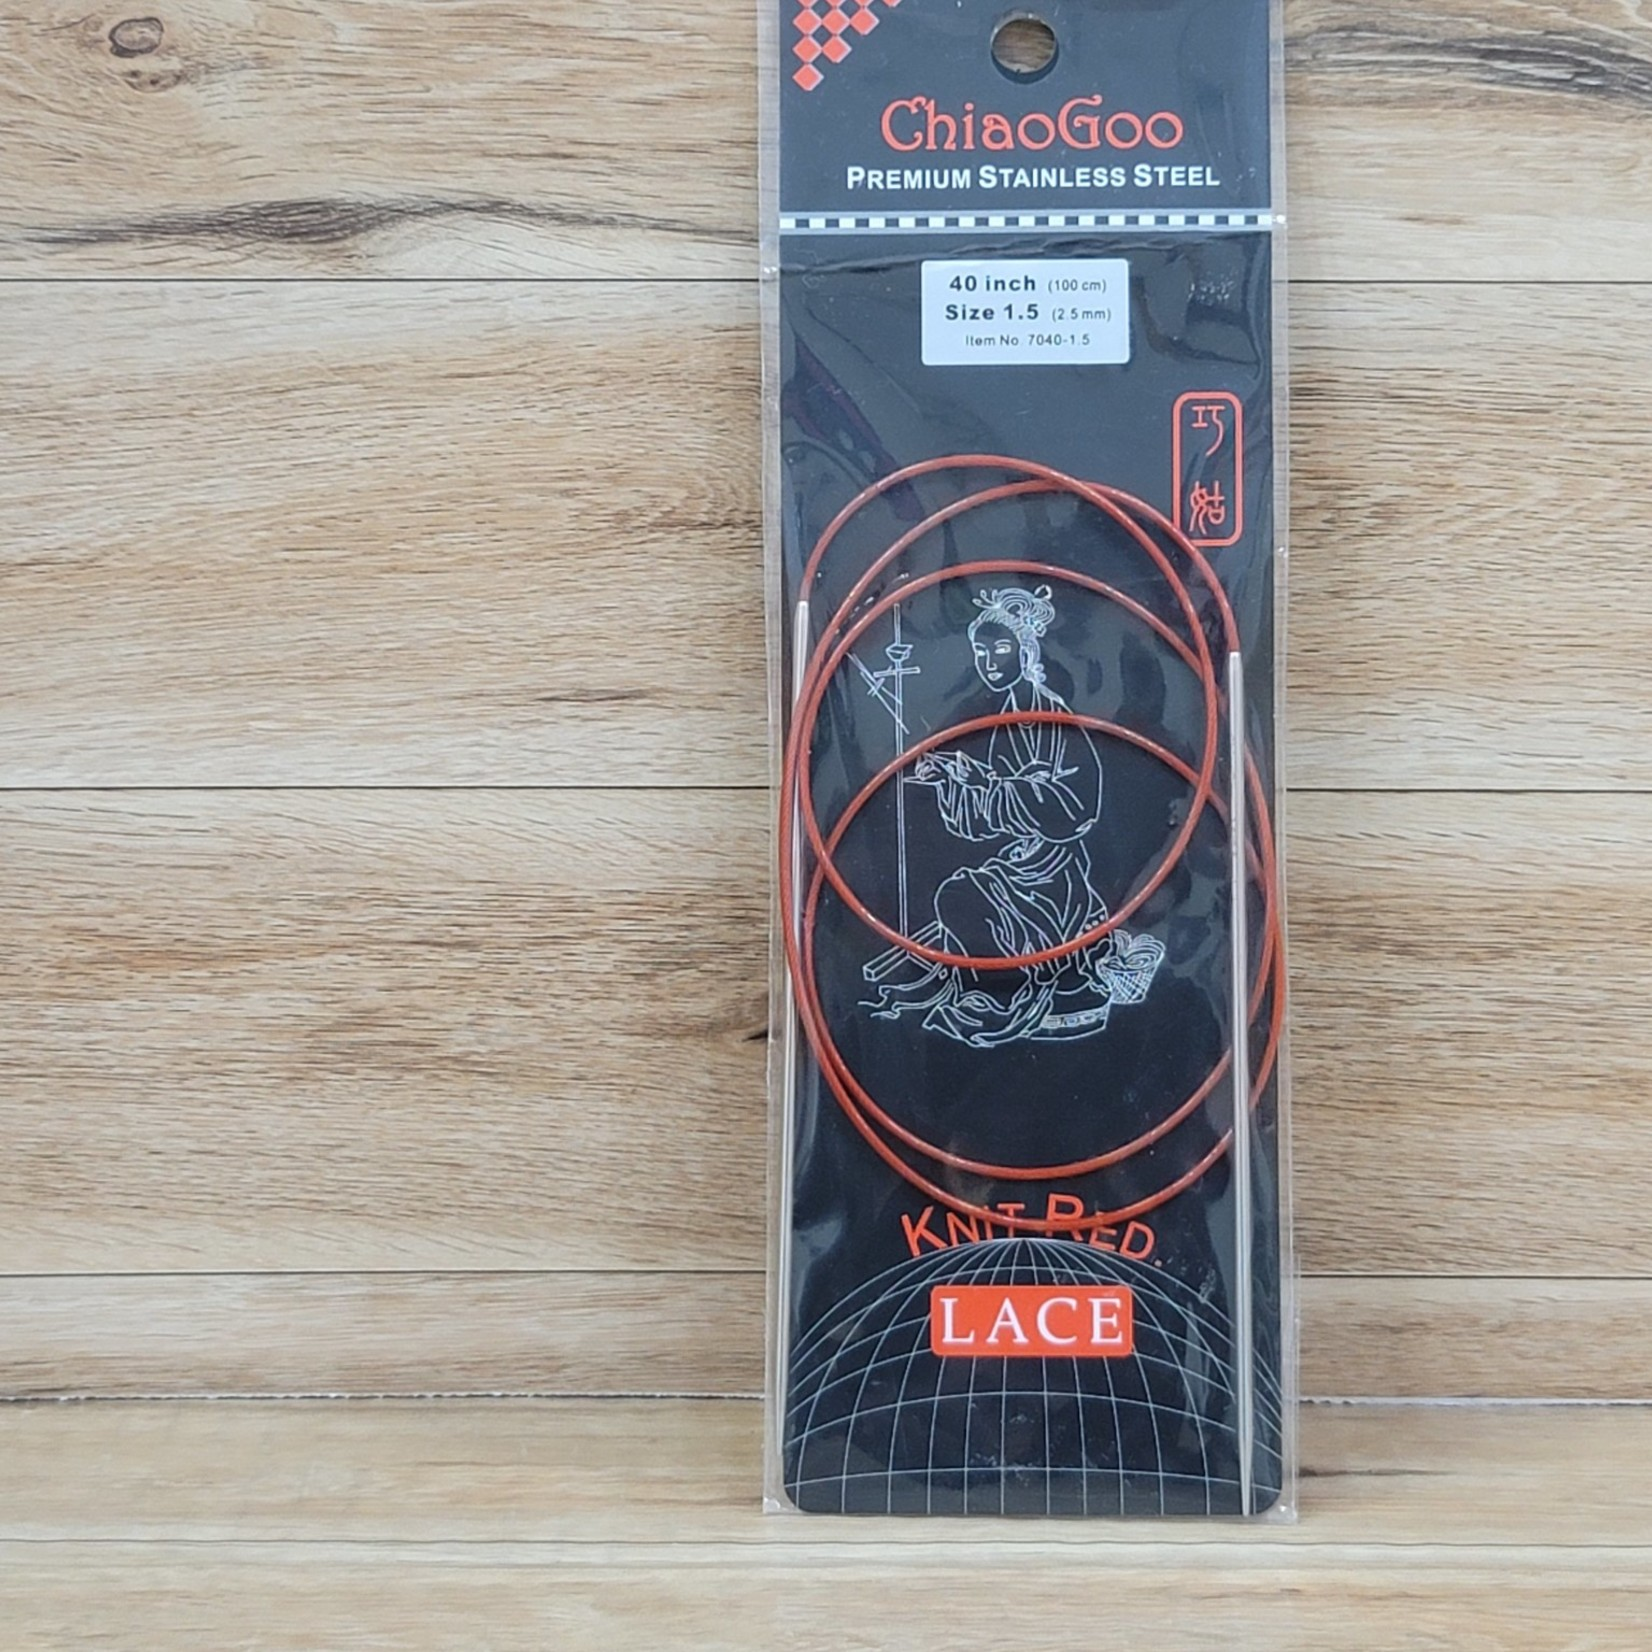 ChiaoGoo - Red Circular Knitting Needles - 40 inch Size 1.5 (2.5mm)